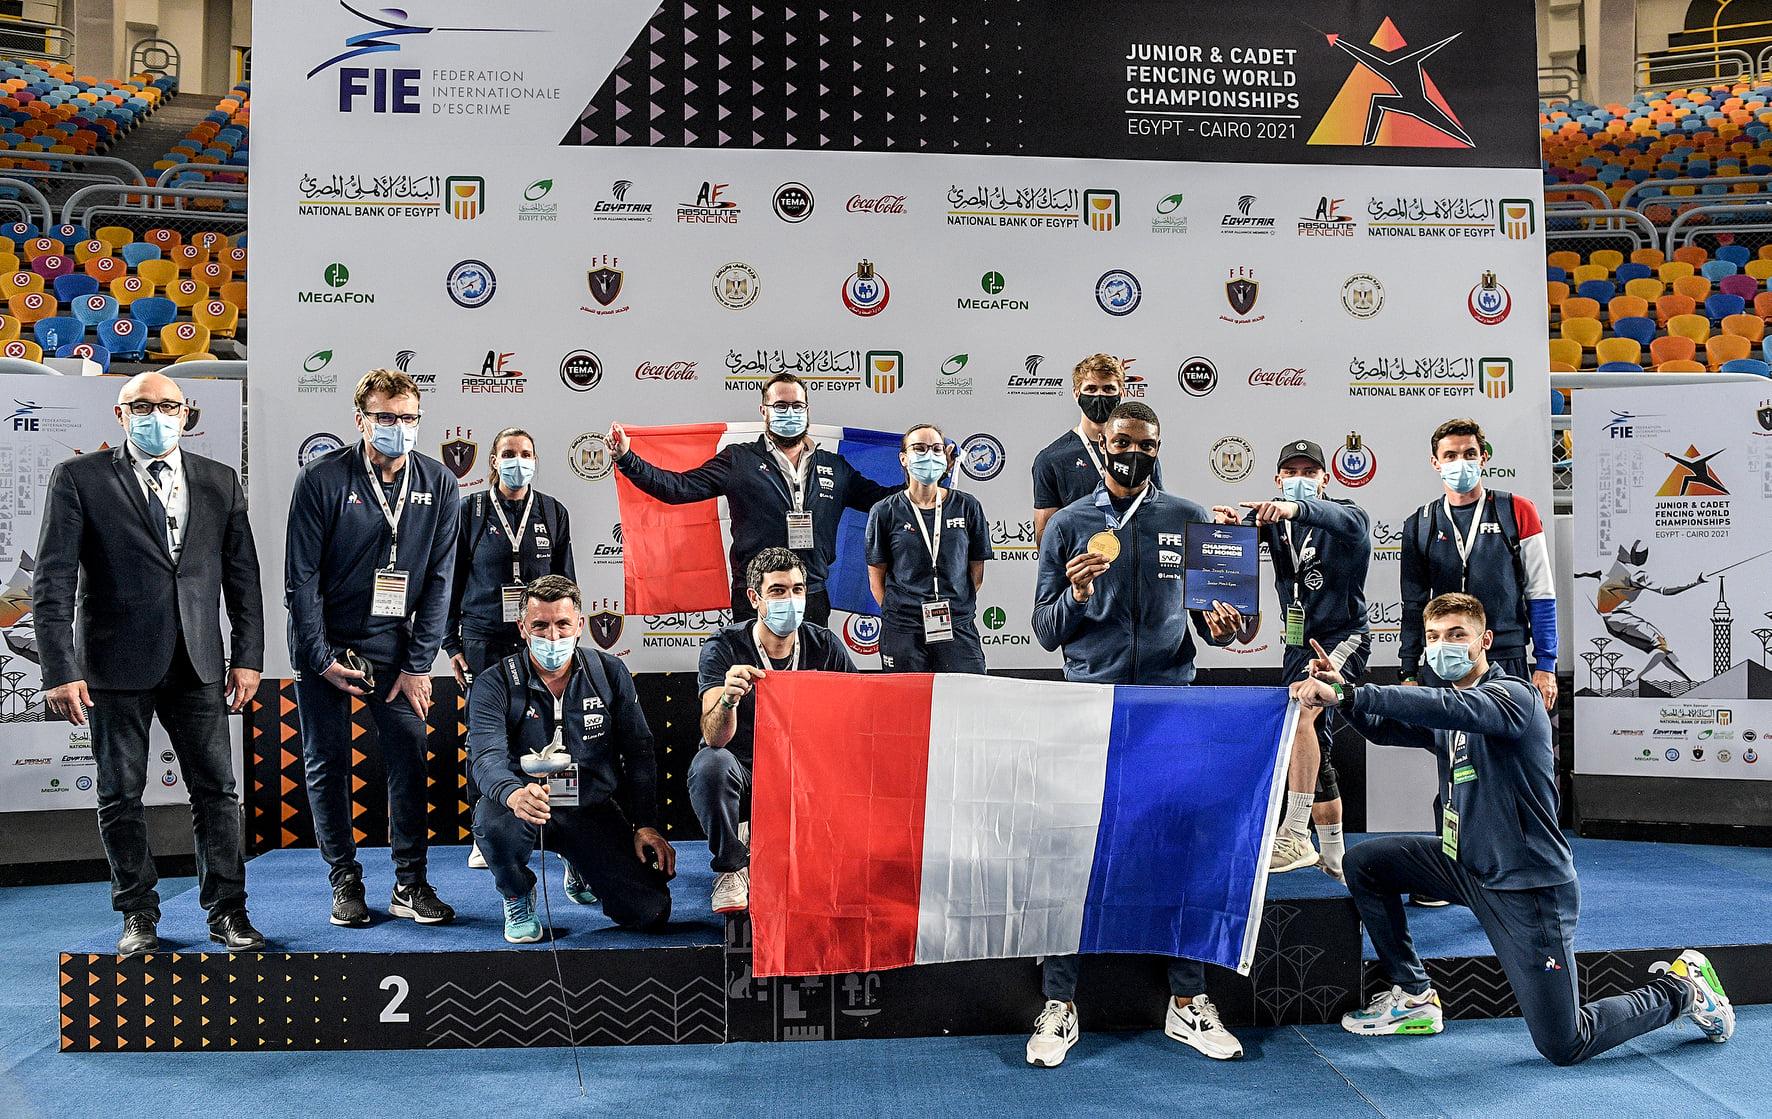 Team France  KendrickJean Joseph  fencing epée espada esgrima